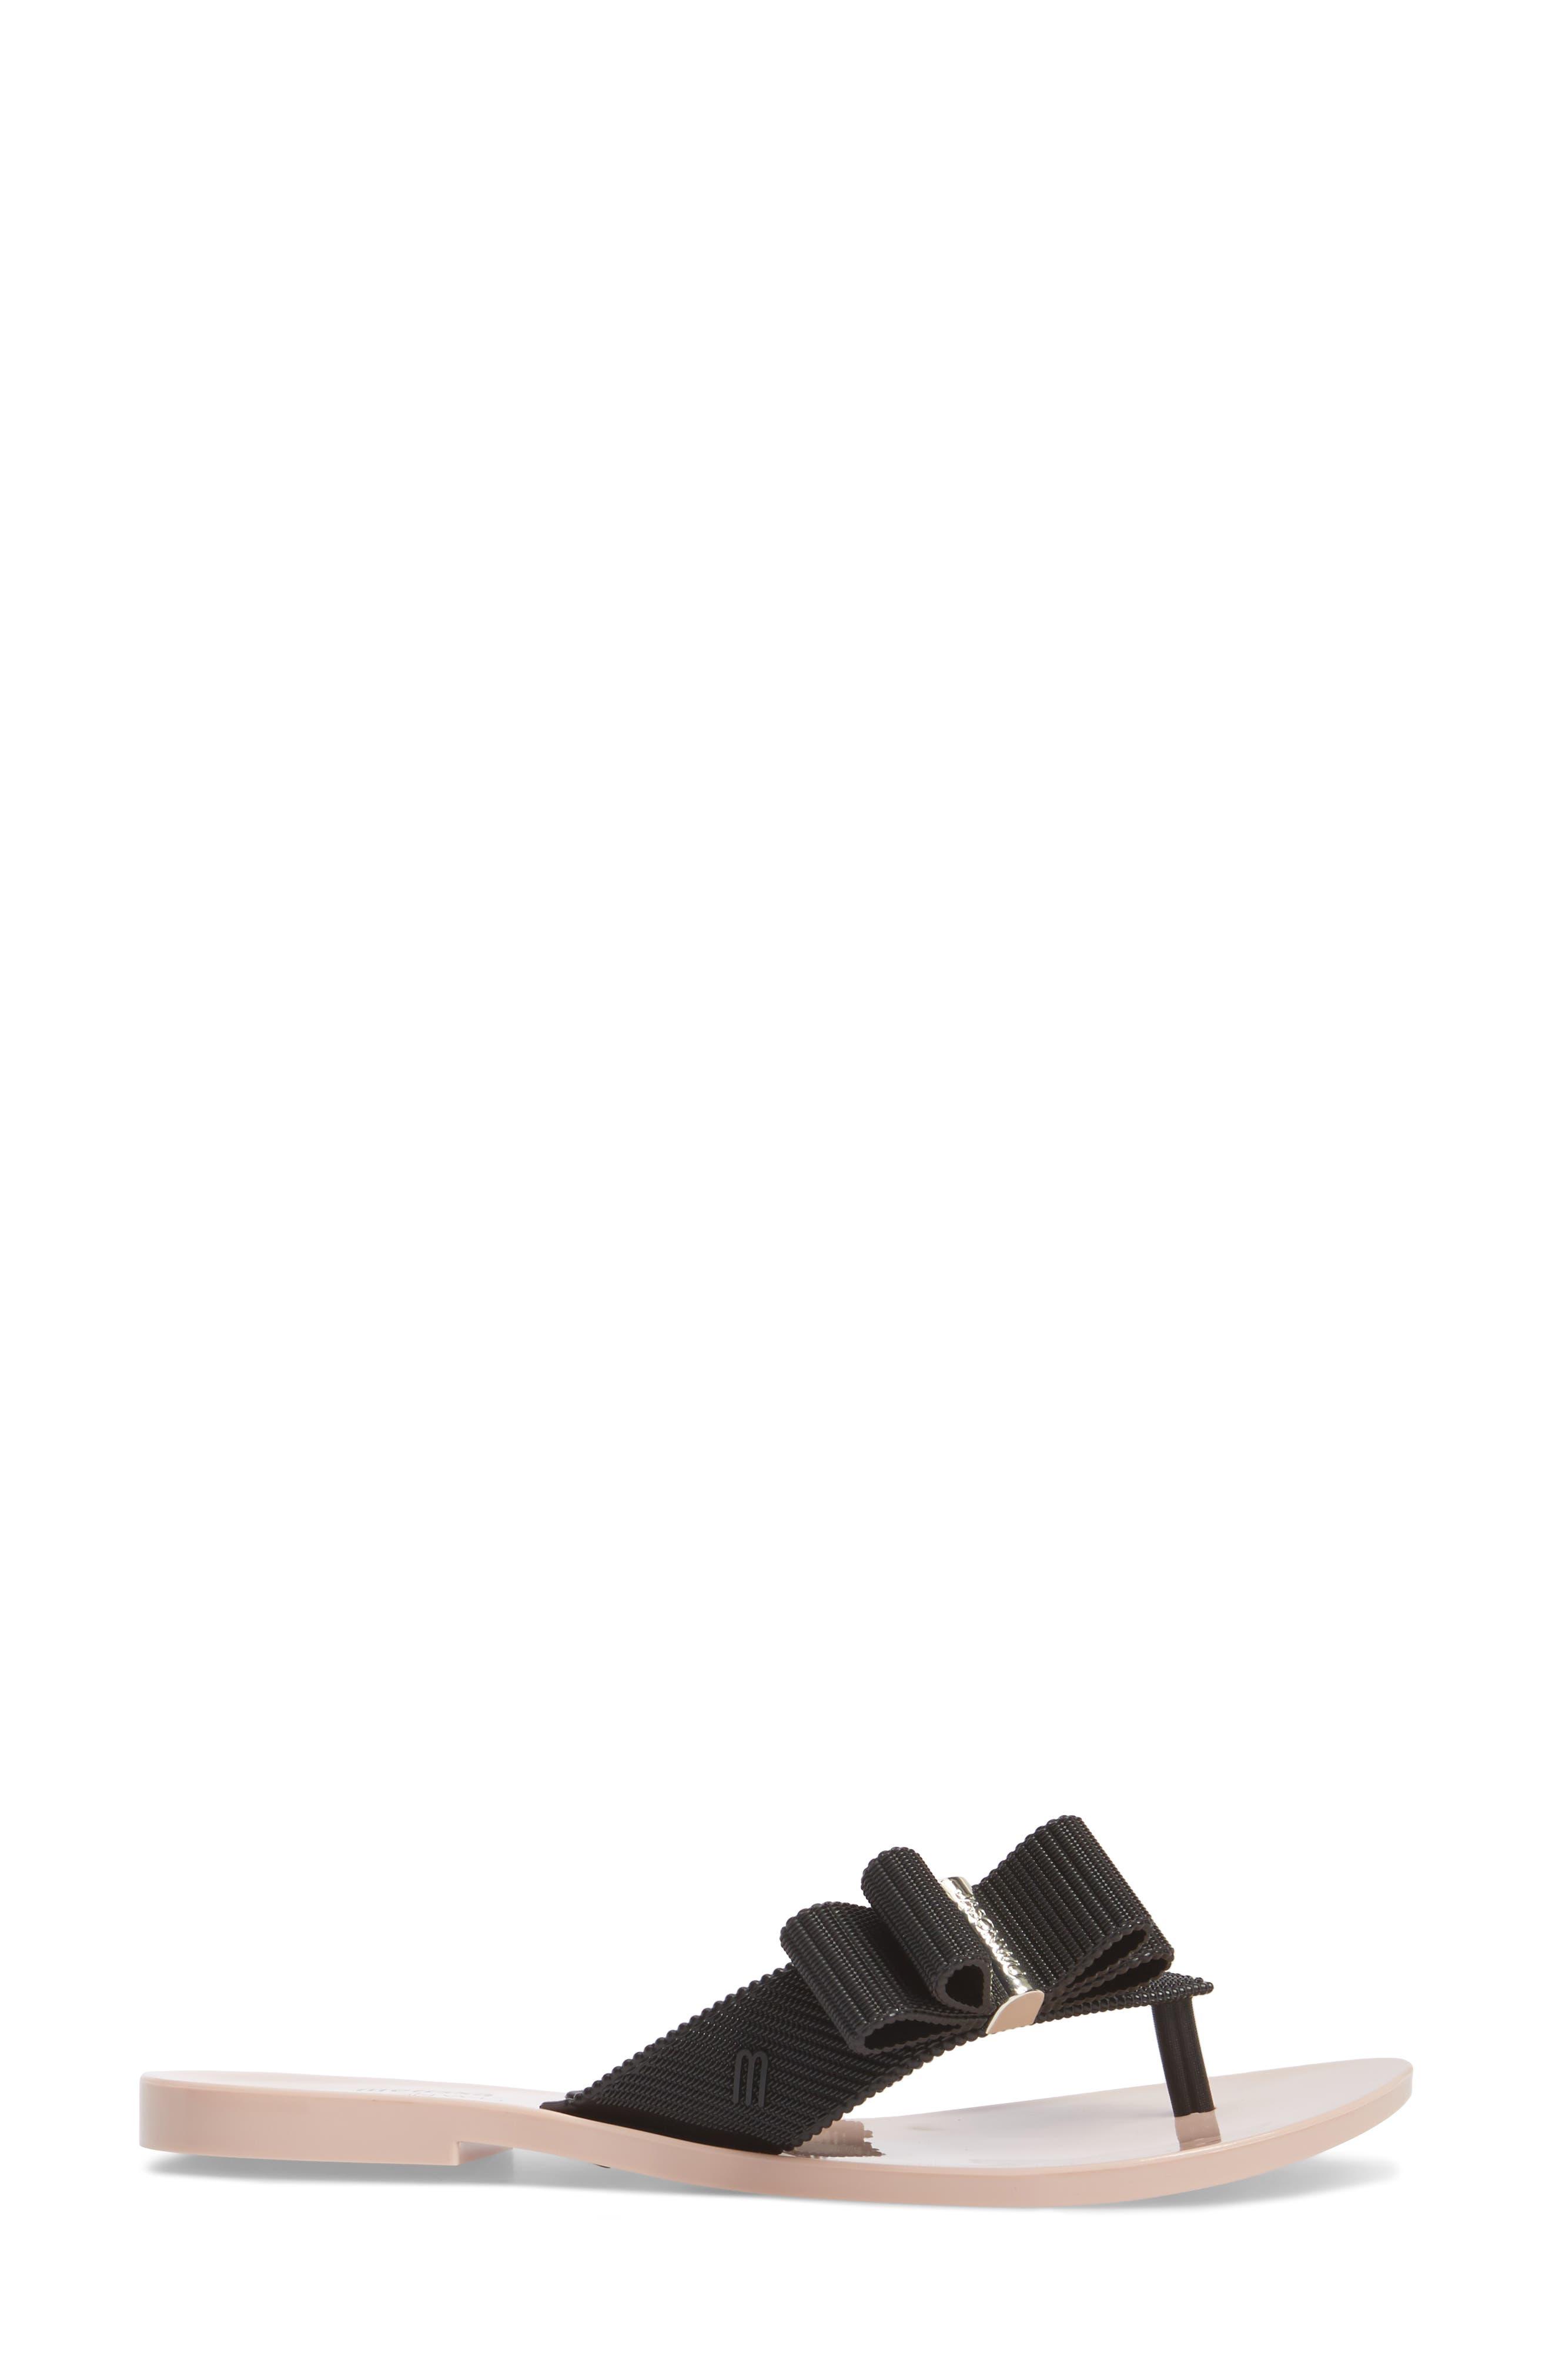 + Jason Wu Girl Bow Flip Flop,                             Alternate thumbnail 3, color,                             Black Pink